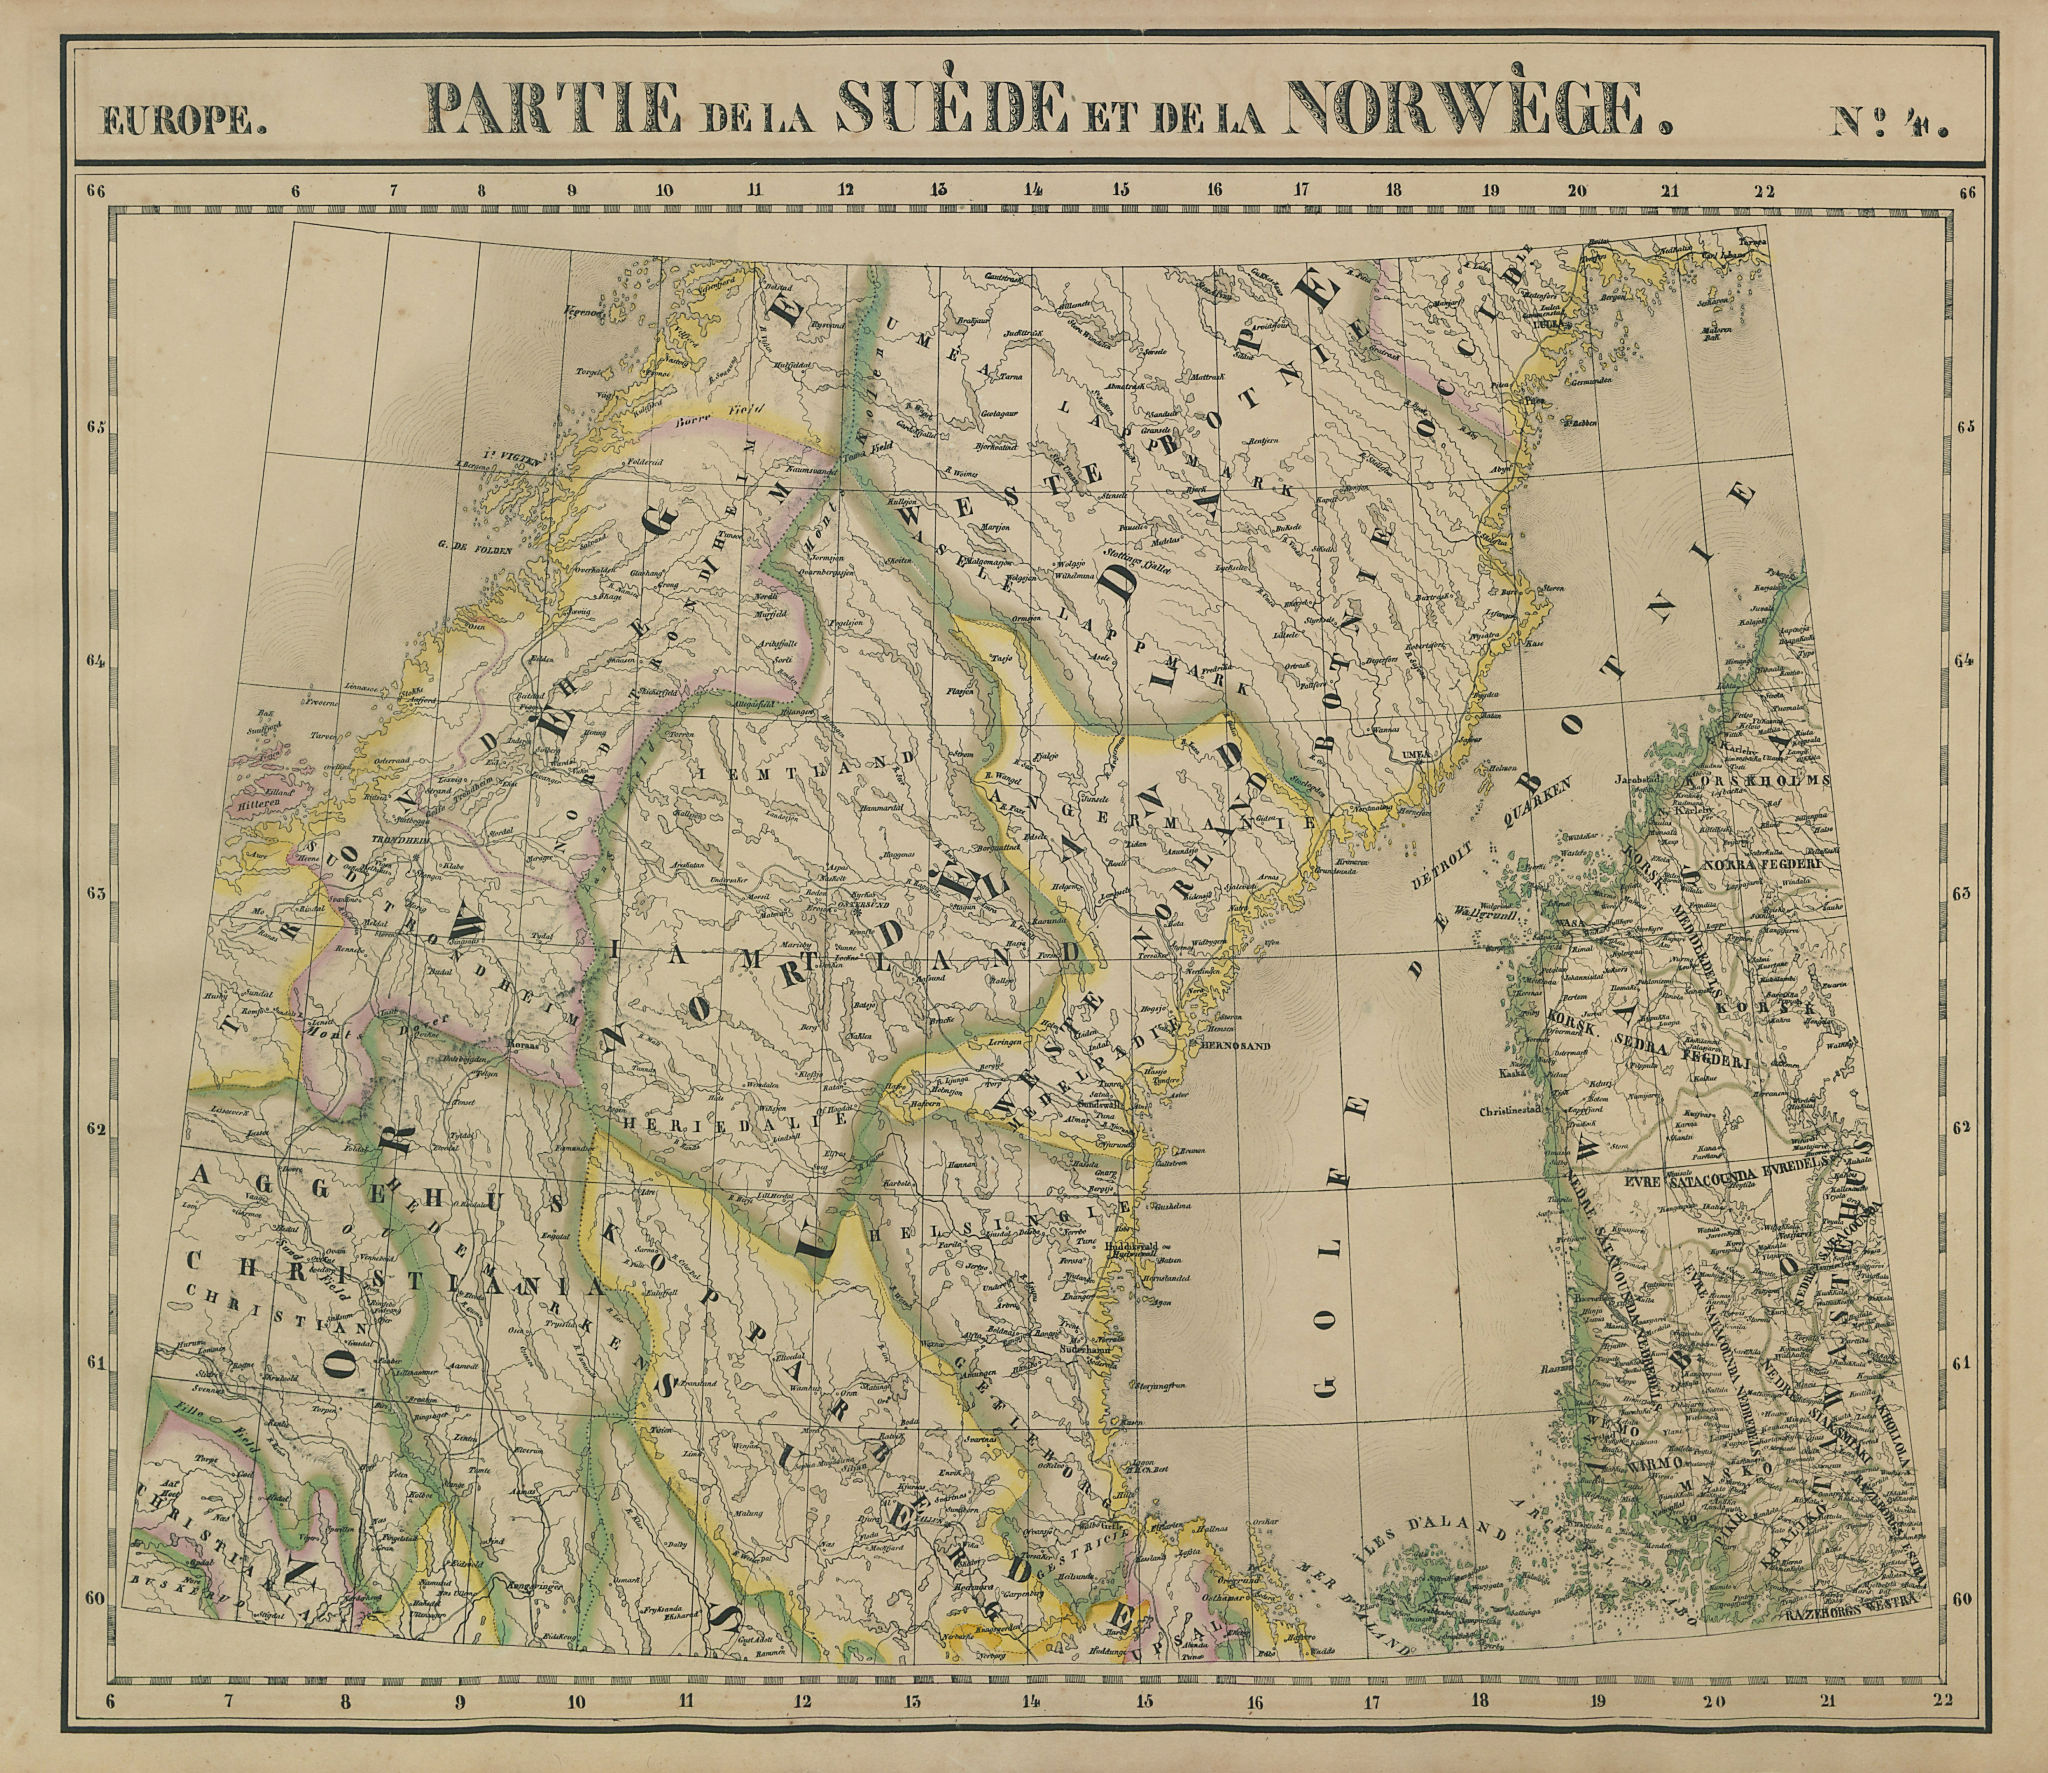 Europe. Suède & Norwège #4 Central Norway Sweden & Finland VANDERMAELEN 1827 map